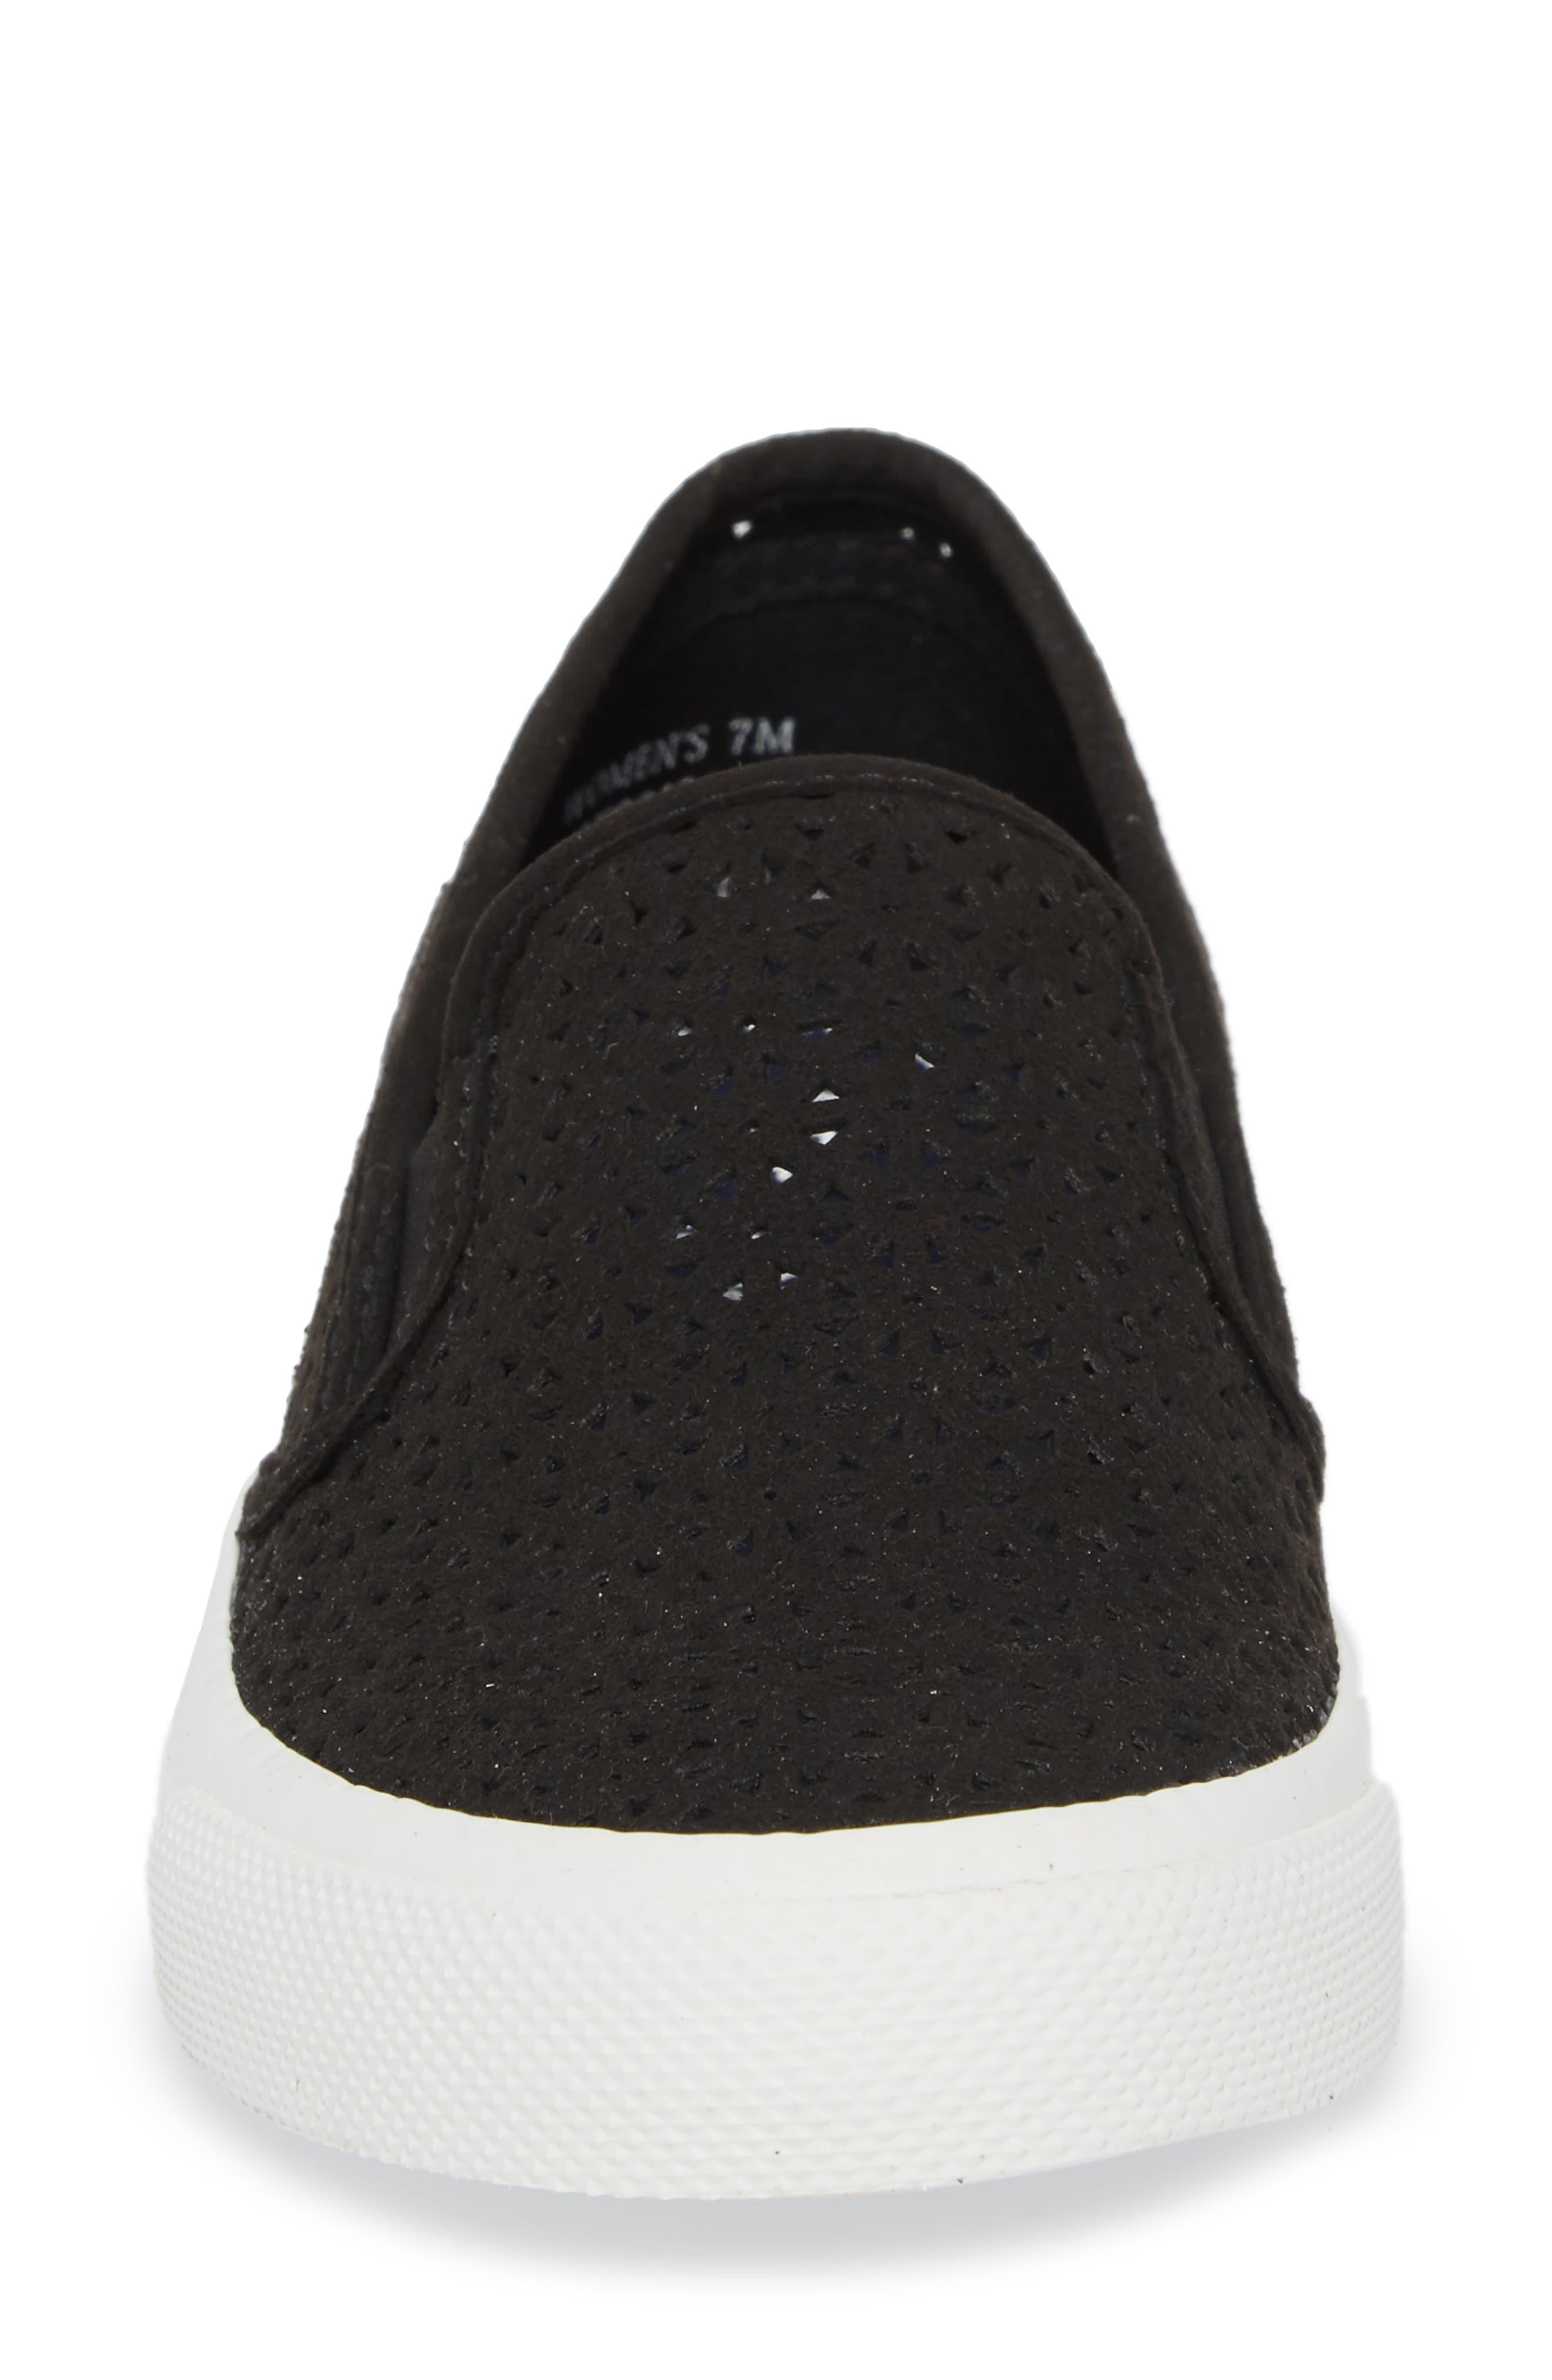 Seaside Nautical Perforated Slip-On Sneaker,                             Alternate thumbnail 4, color,                             BLACK LEATHER